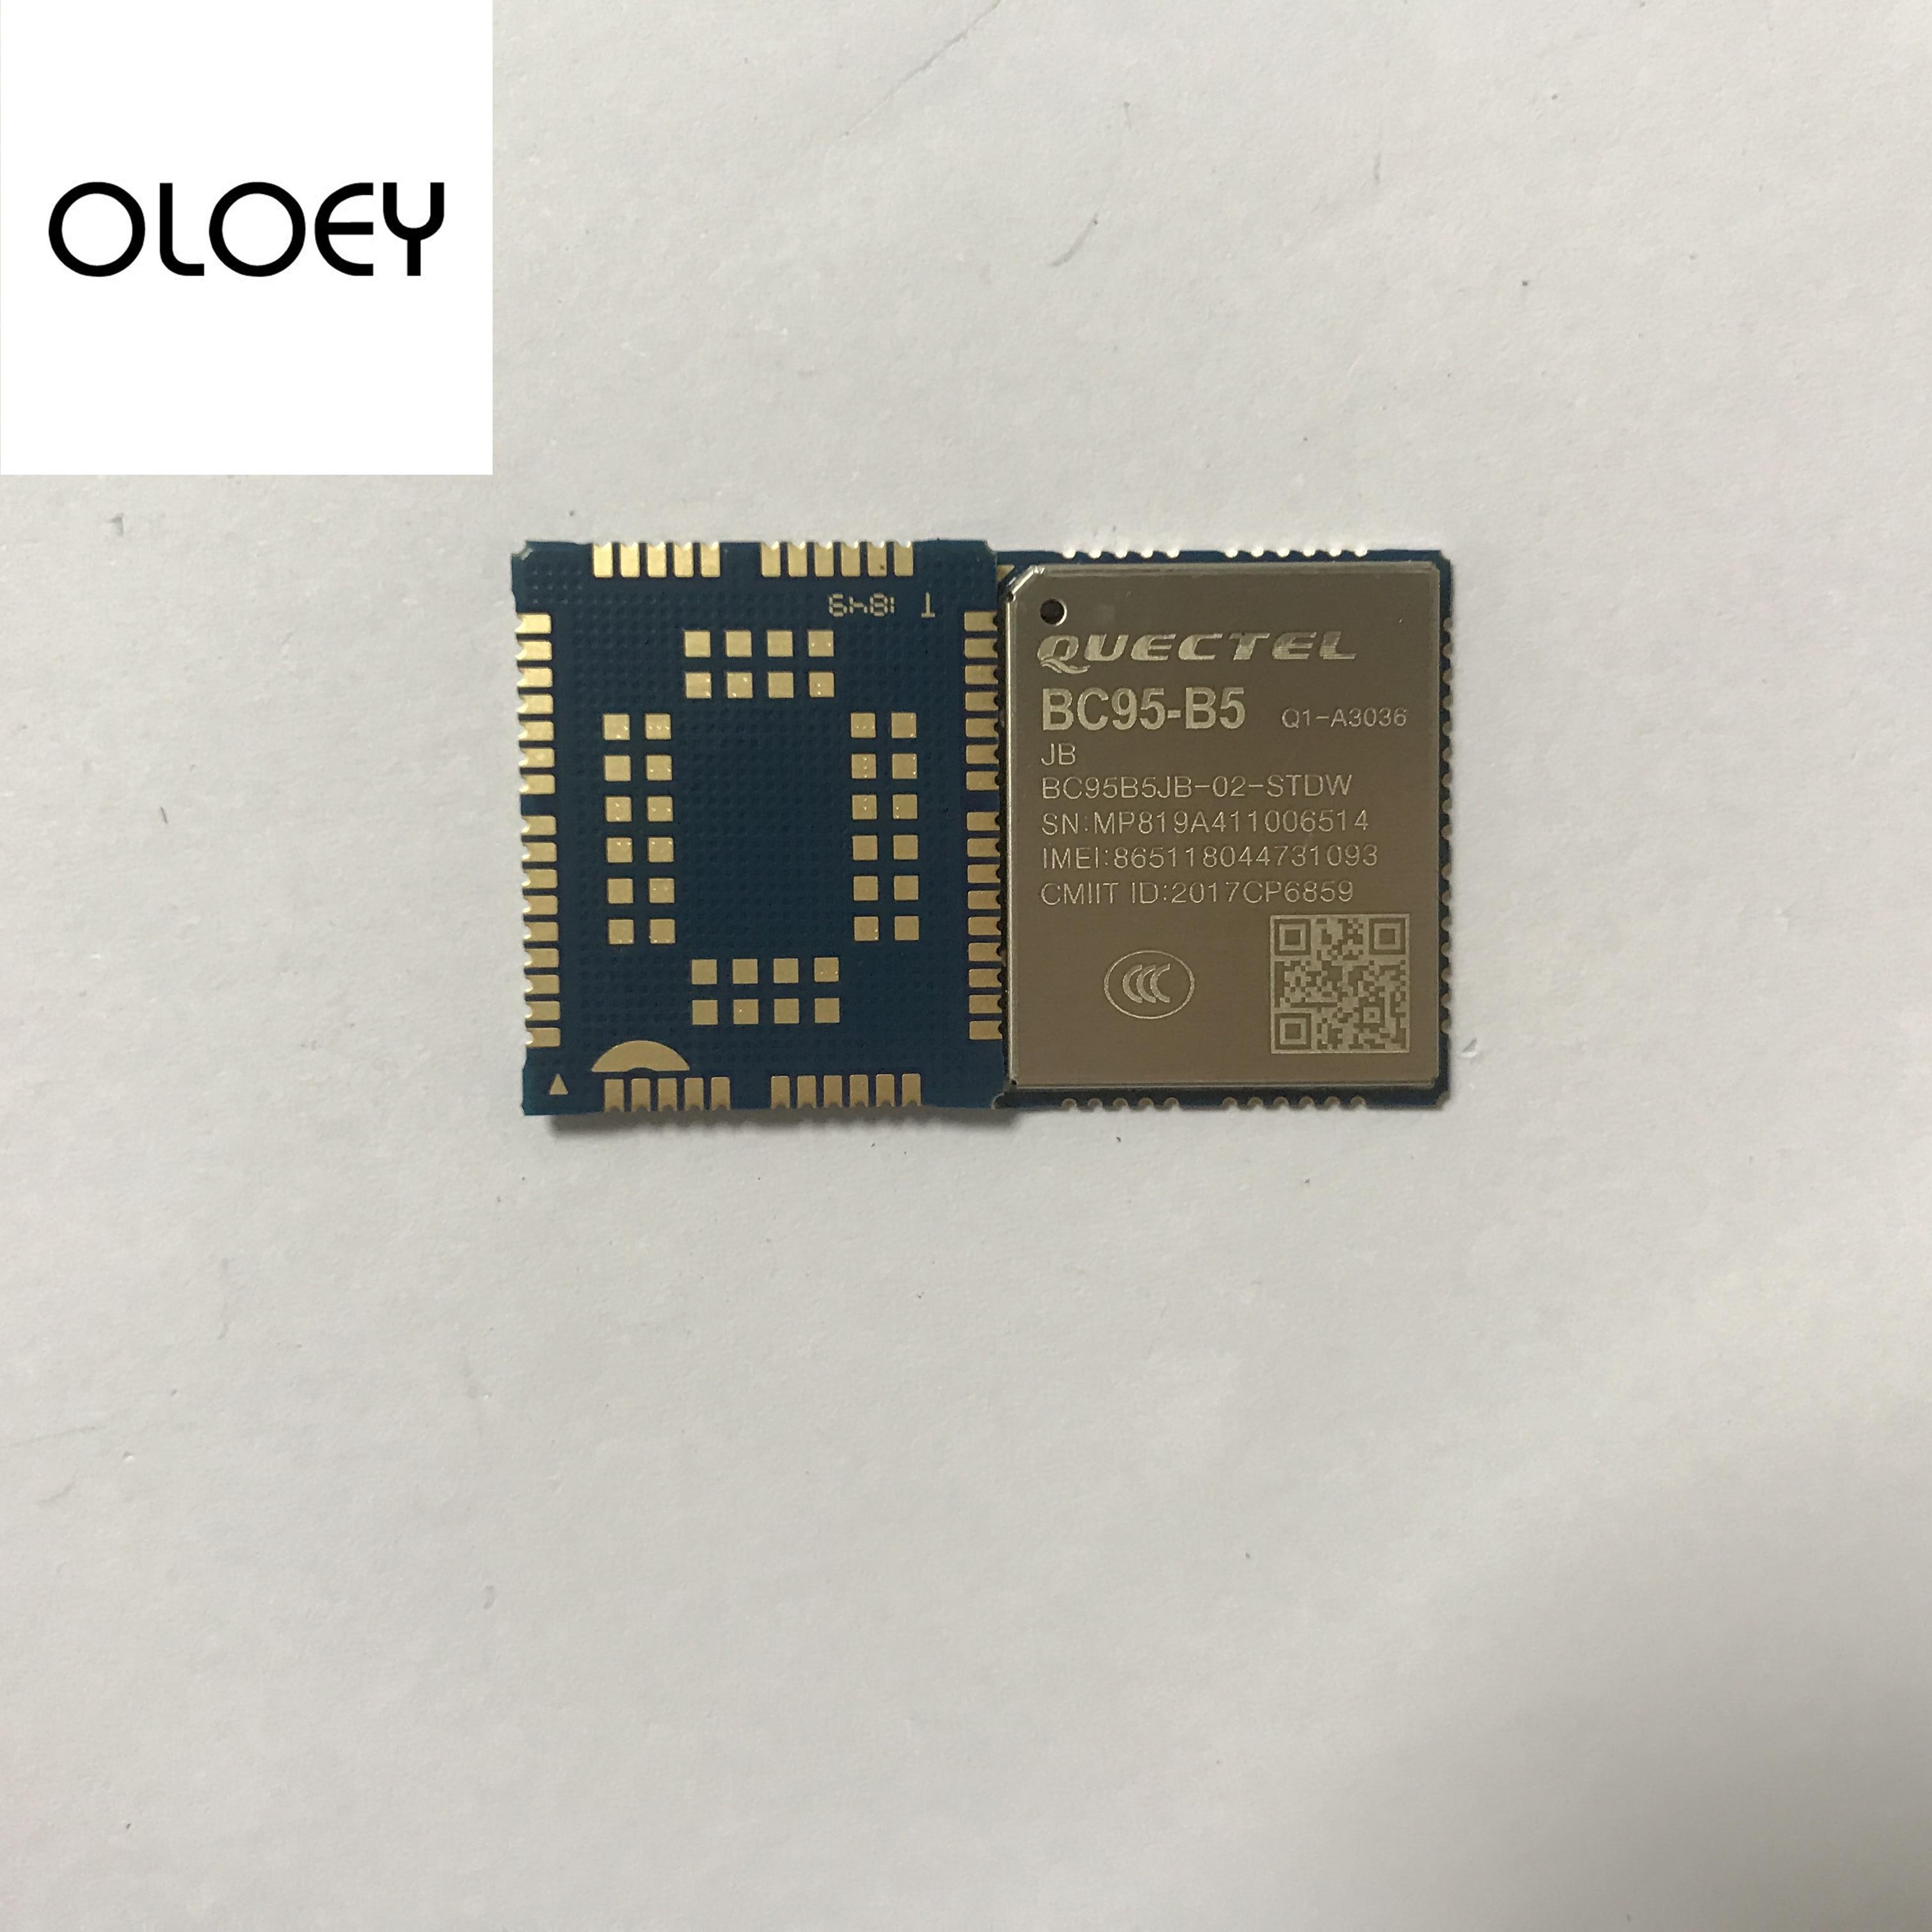 BC95B5JC-02-STD QUECTEL MODULE